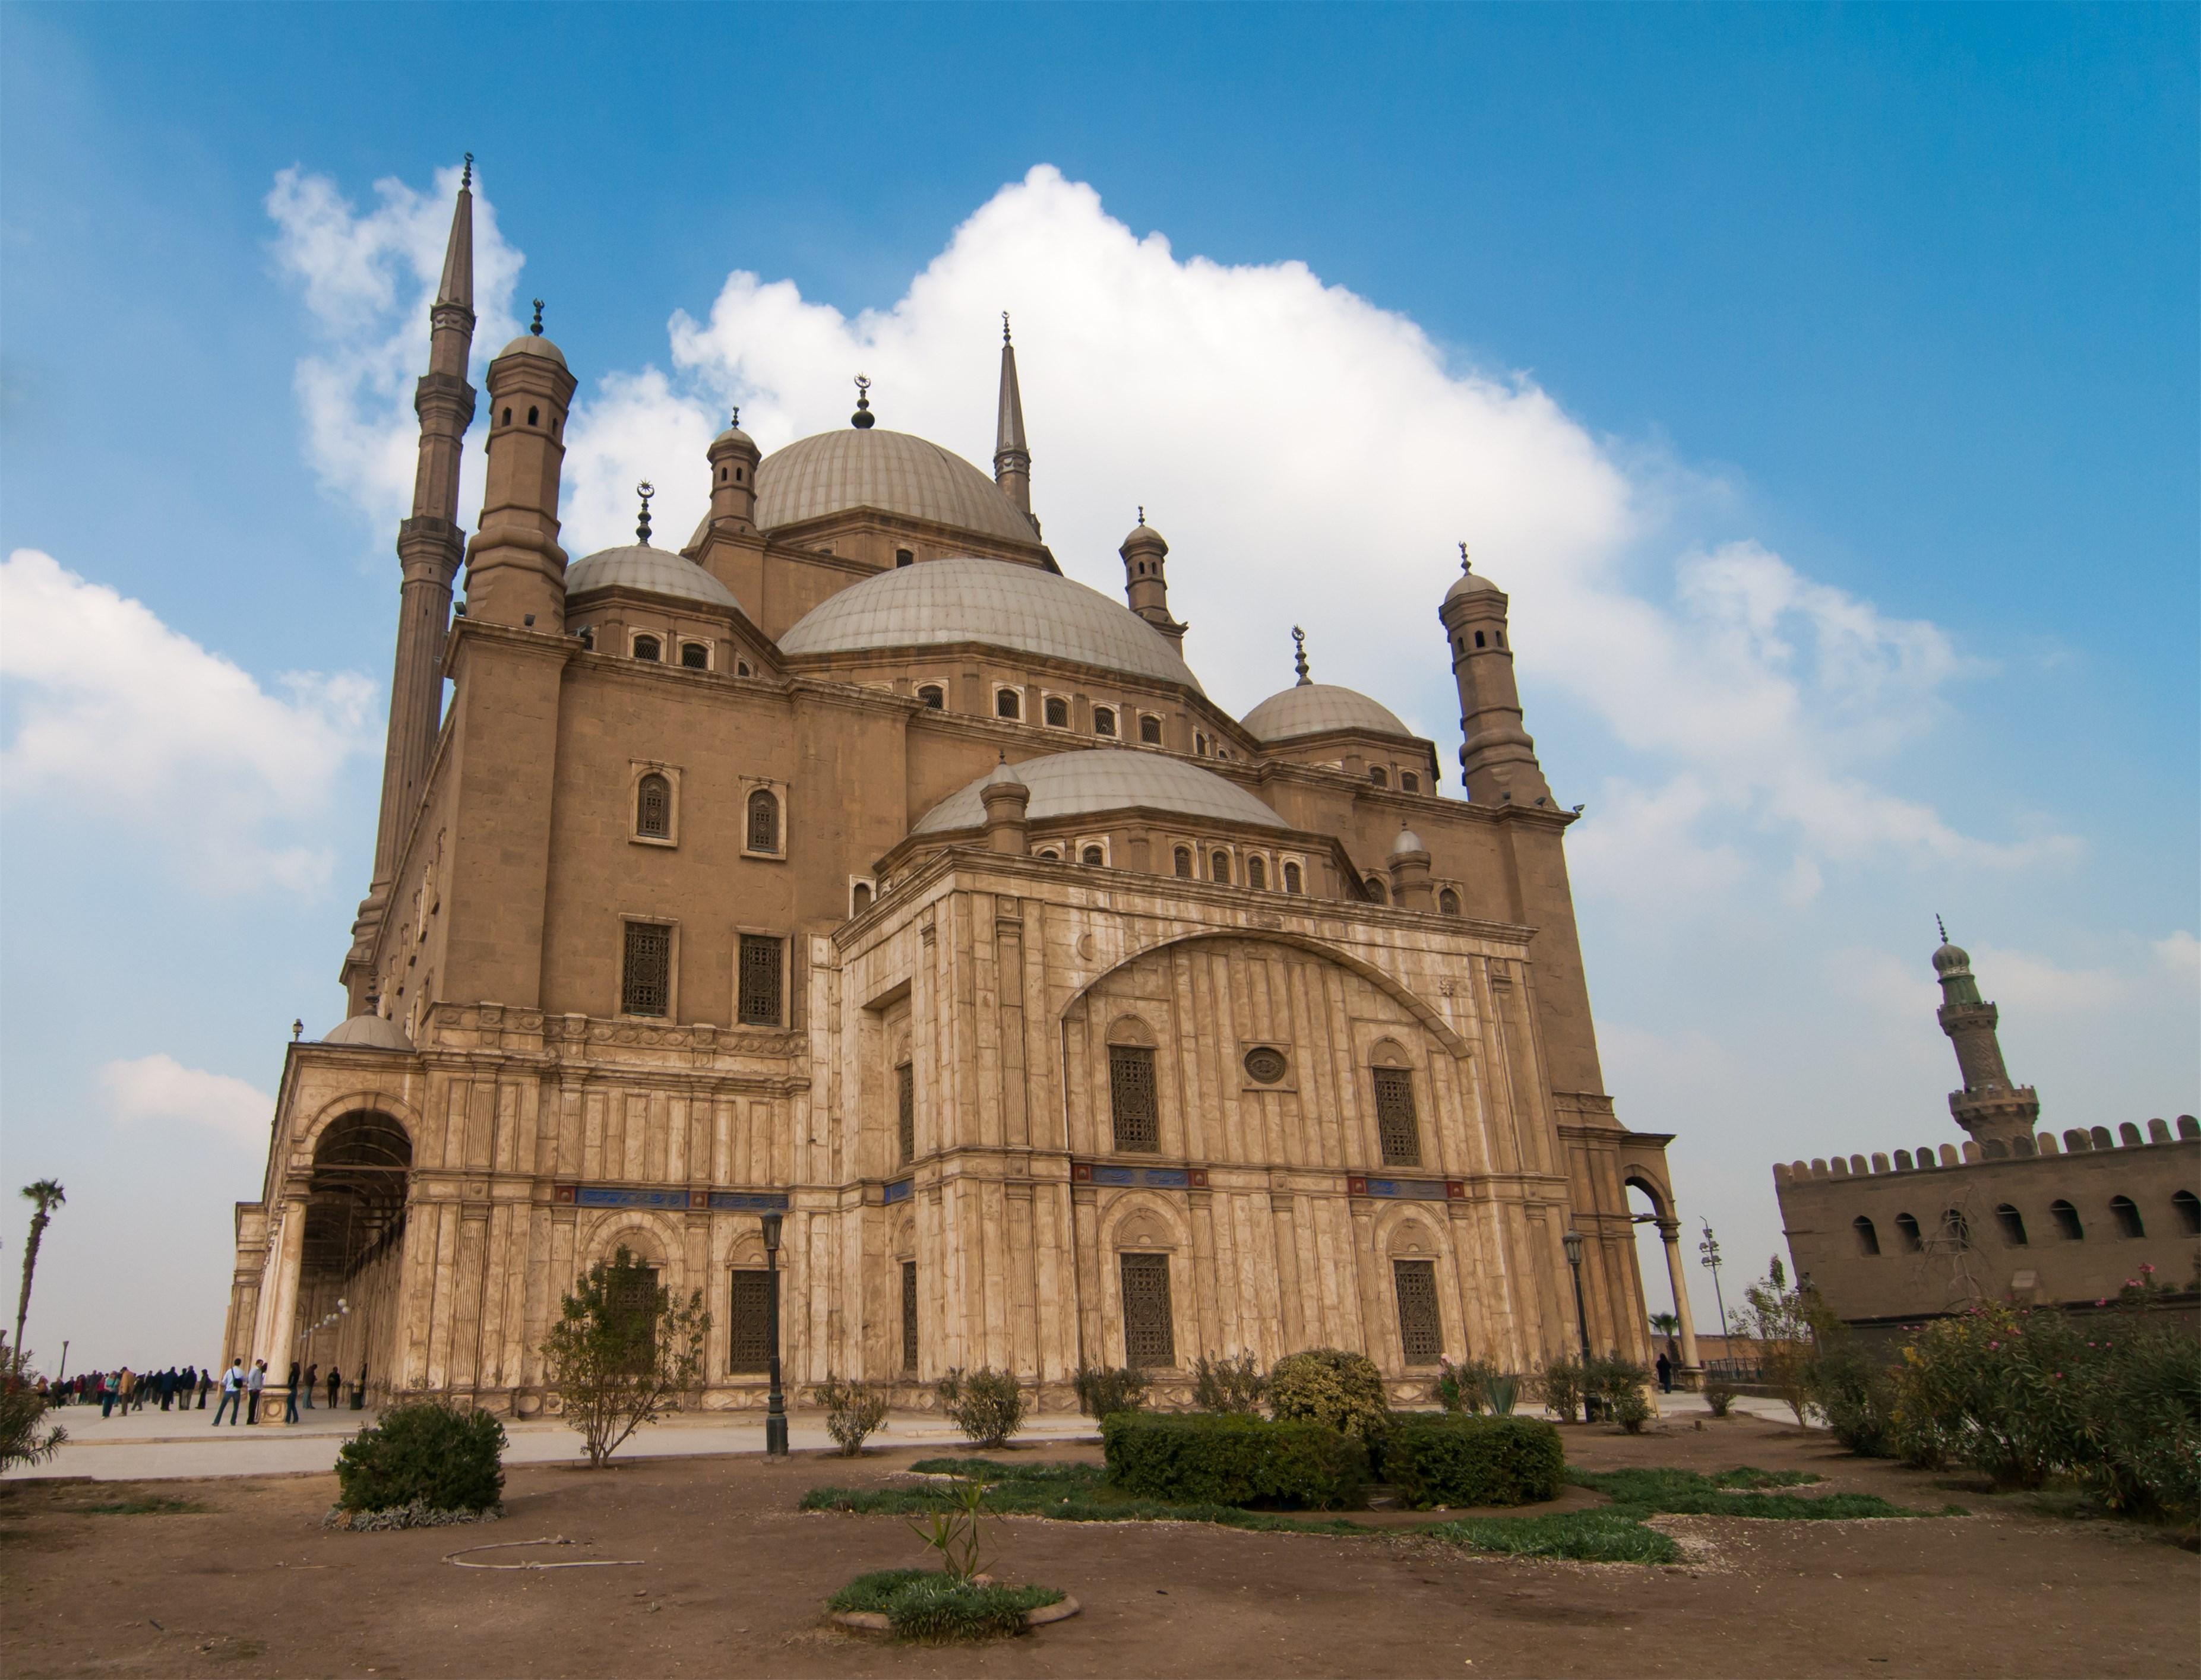 Cairo: A Splendid Panorama of Ancient Egyptian Civilization